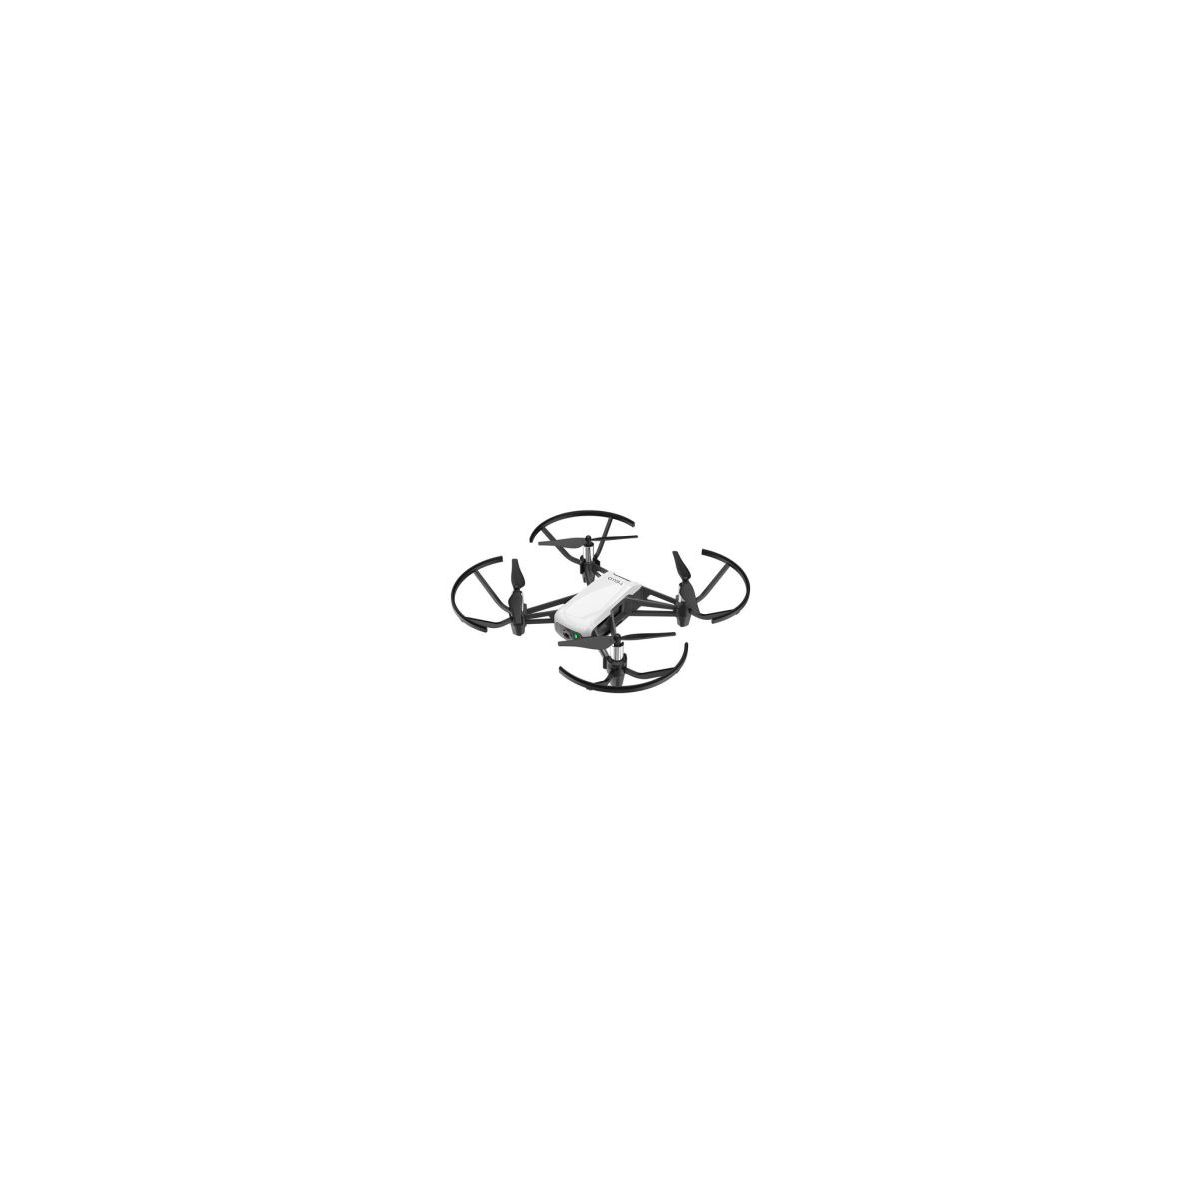 Drone DJI Ryze Tello White